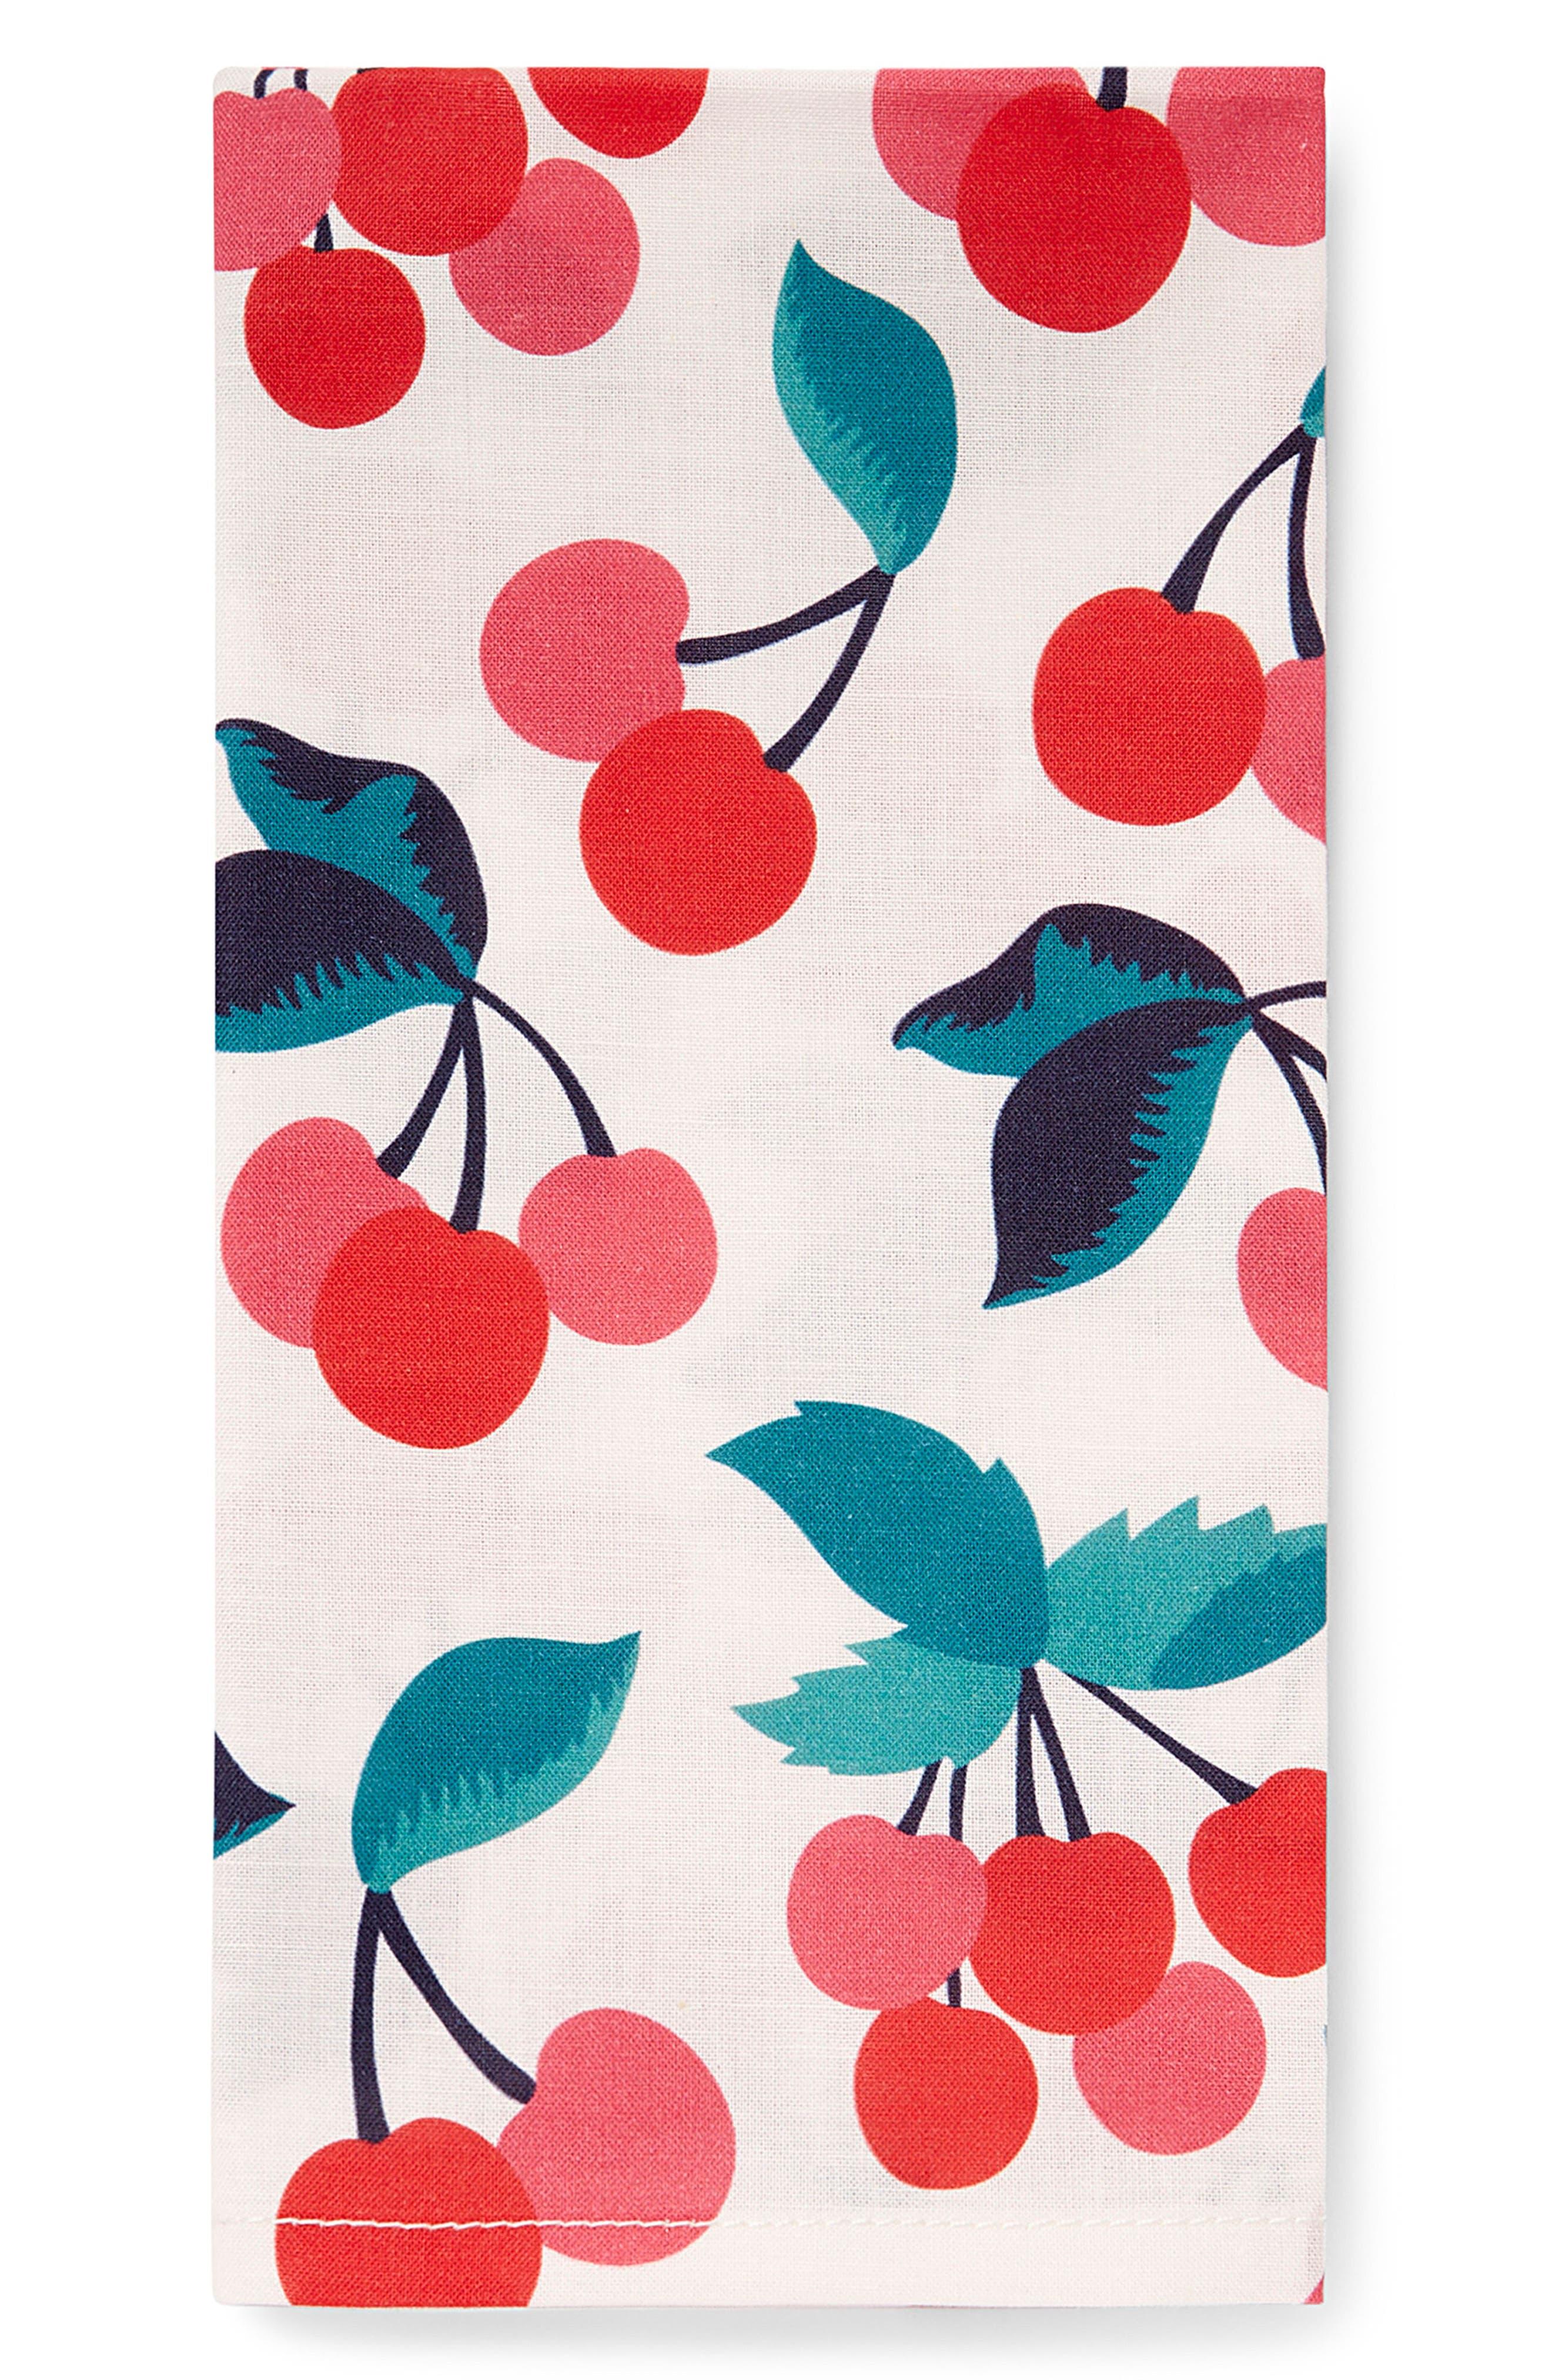 Set of 4 Cherry Print Cloth Napkins,                             Main thumbnail 1, color,                             600